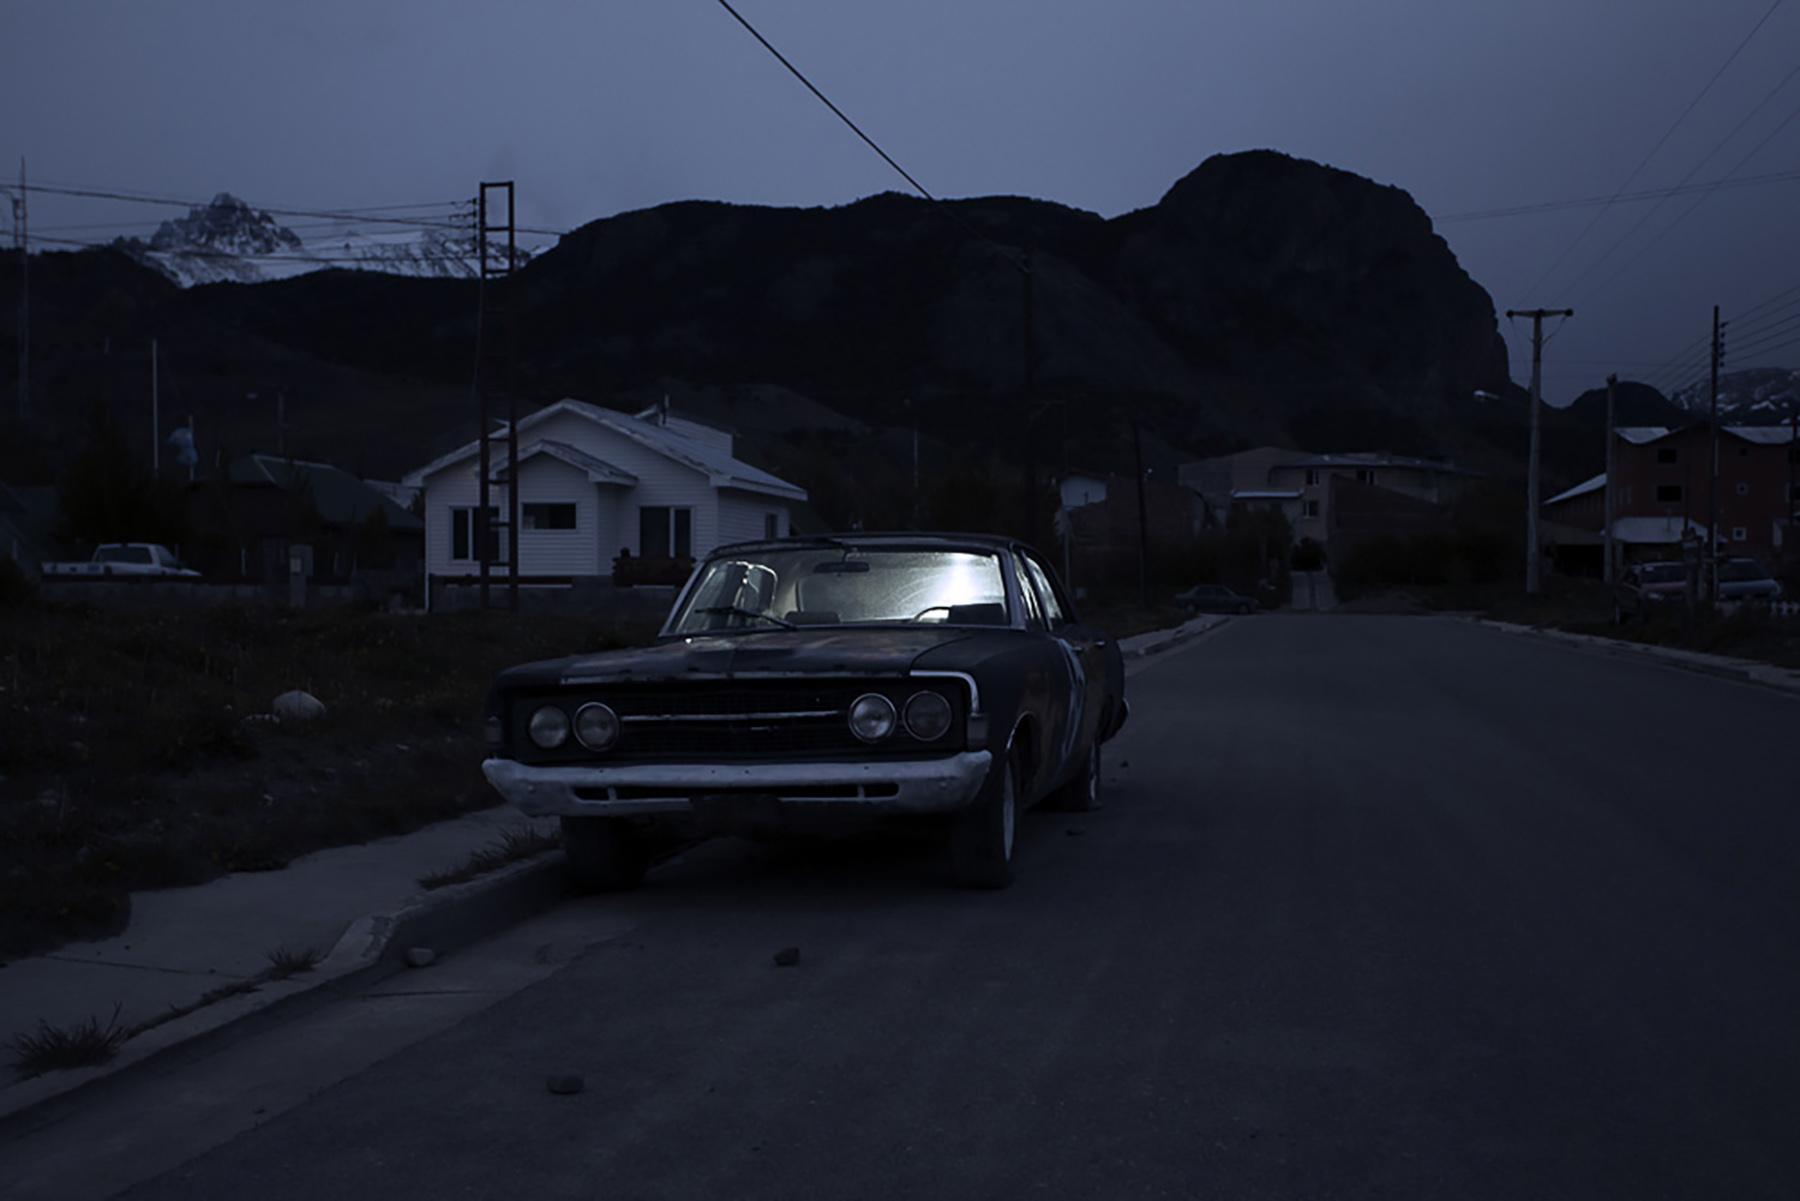 iGNANT-Julien-Mauve-After-Lights-Out-16